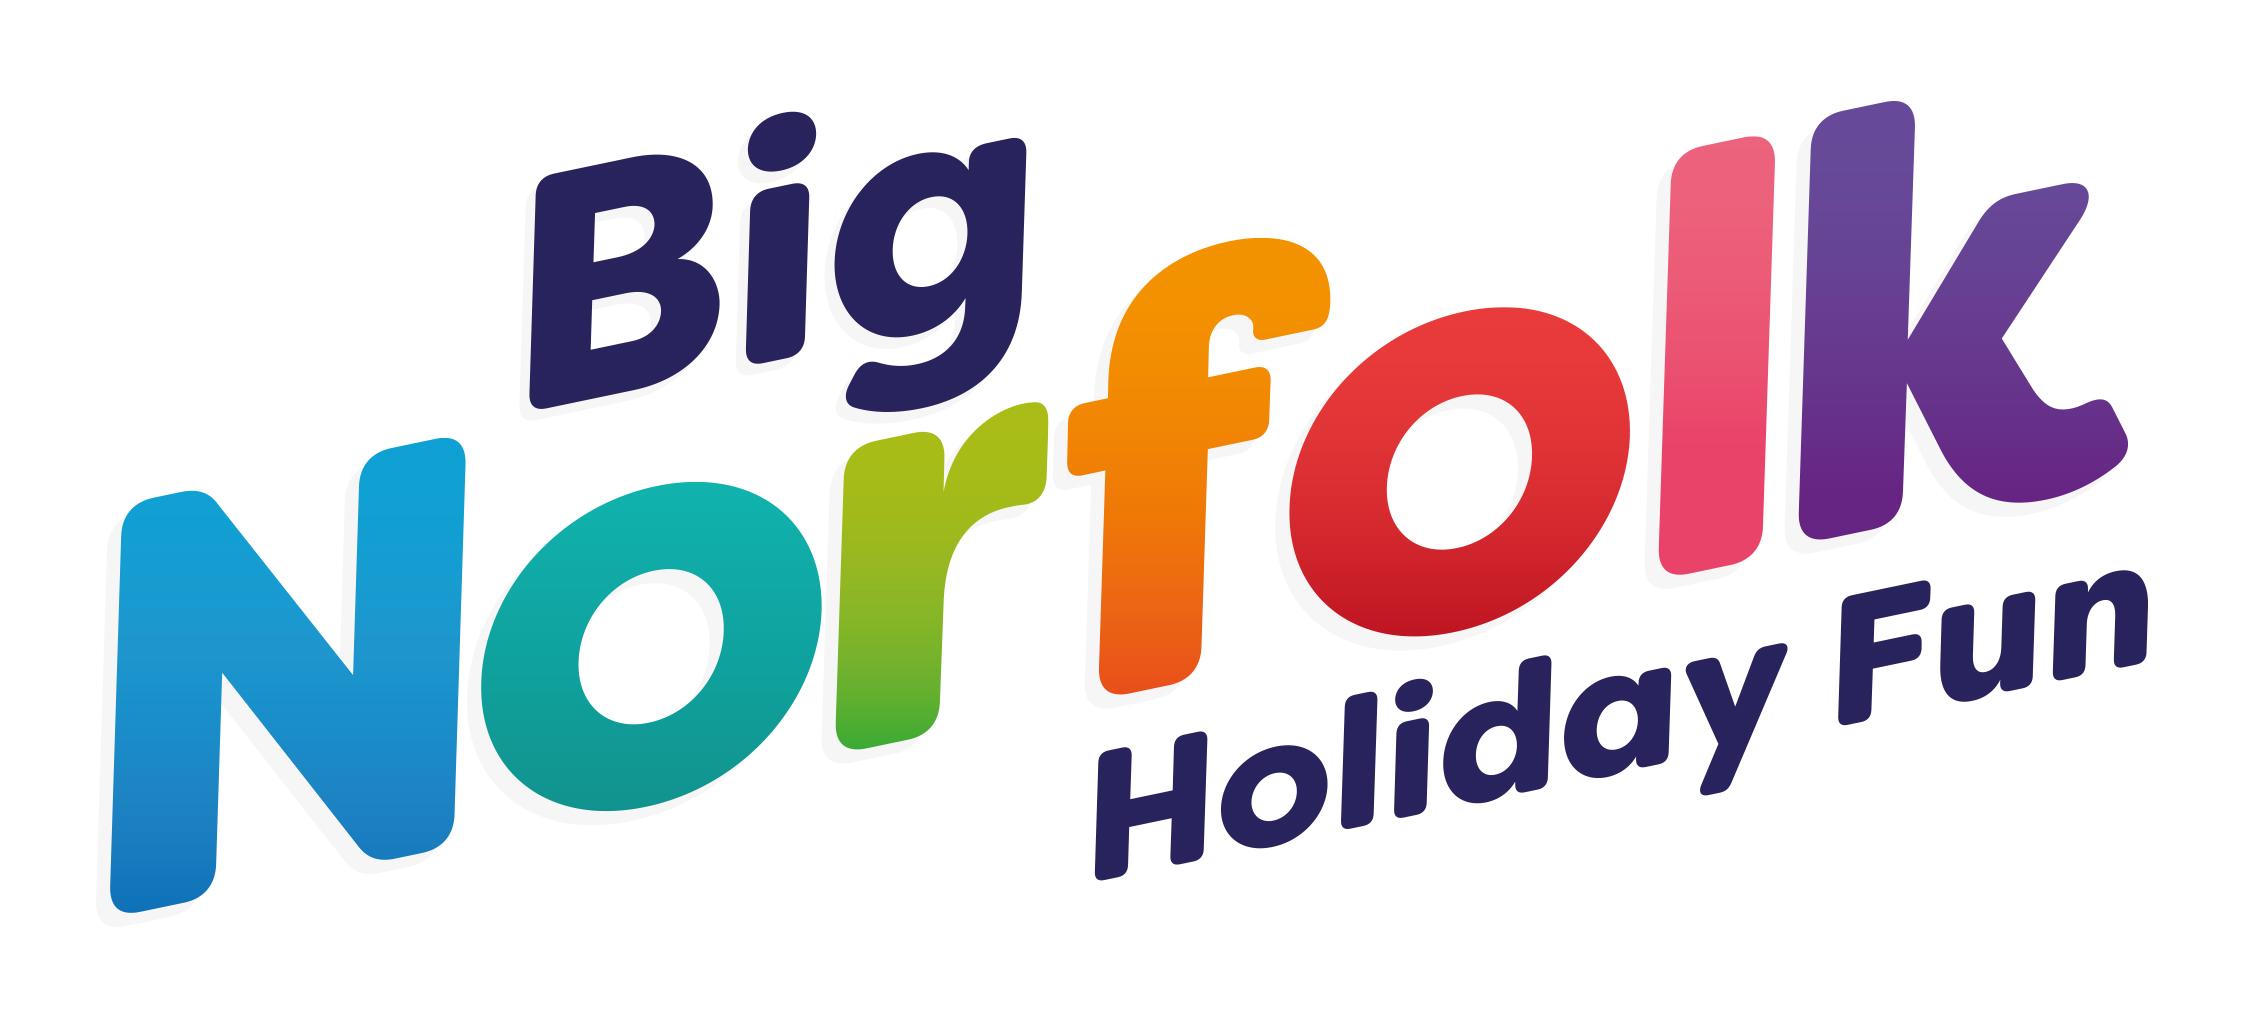 Big Norfolk Holiday Fun logo